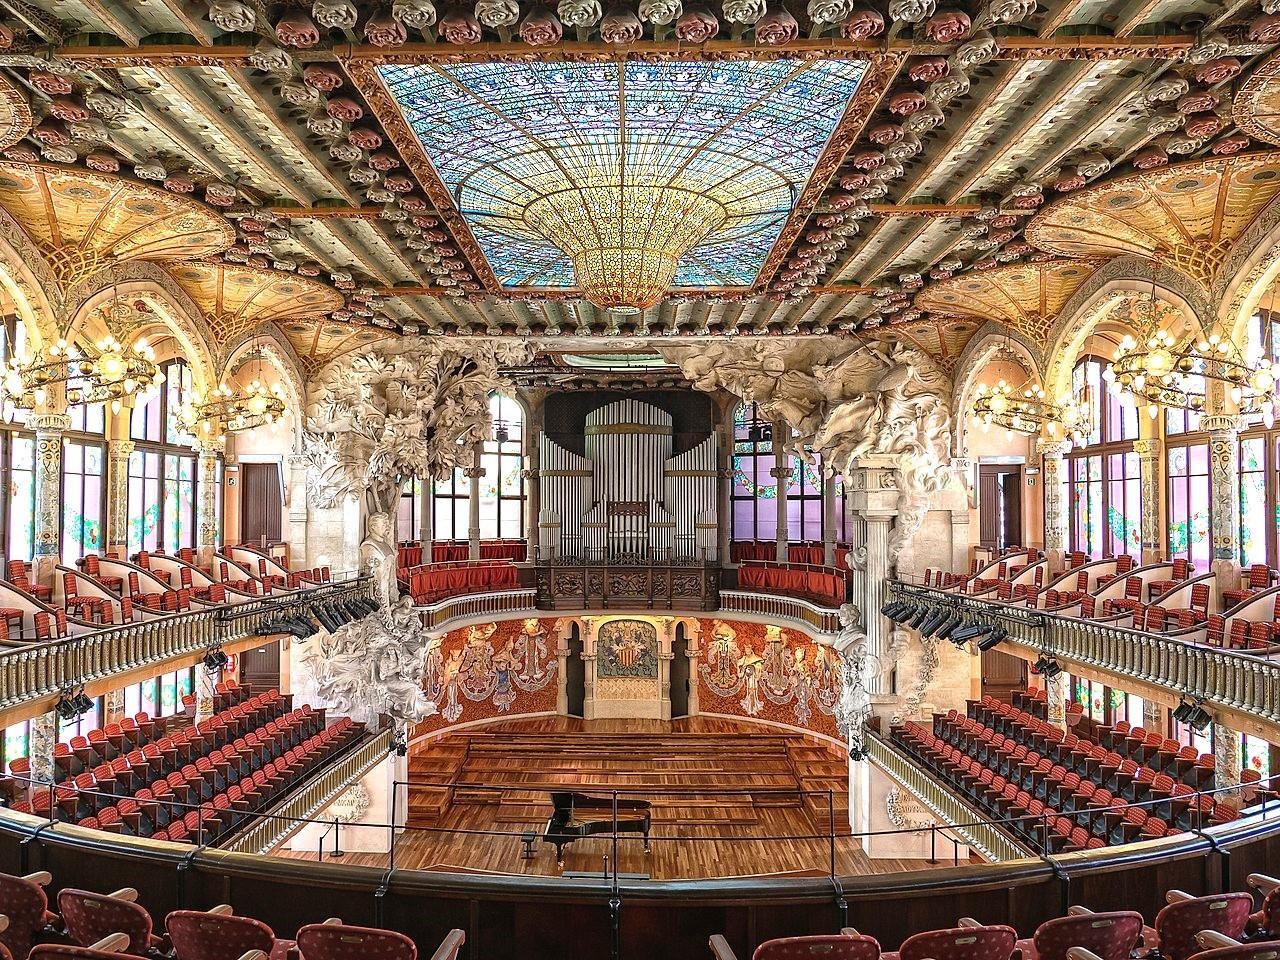 visitez le Palau de la Música Catalana